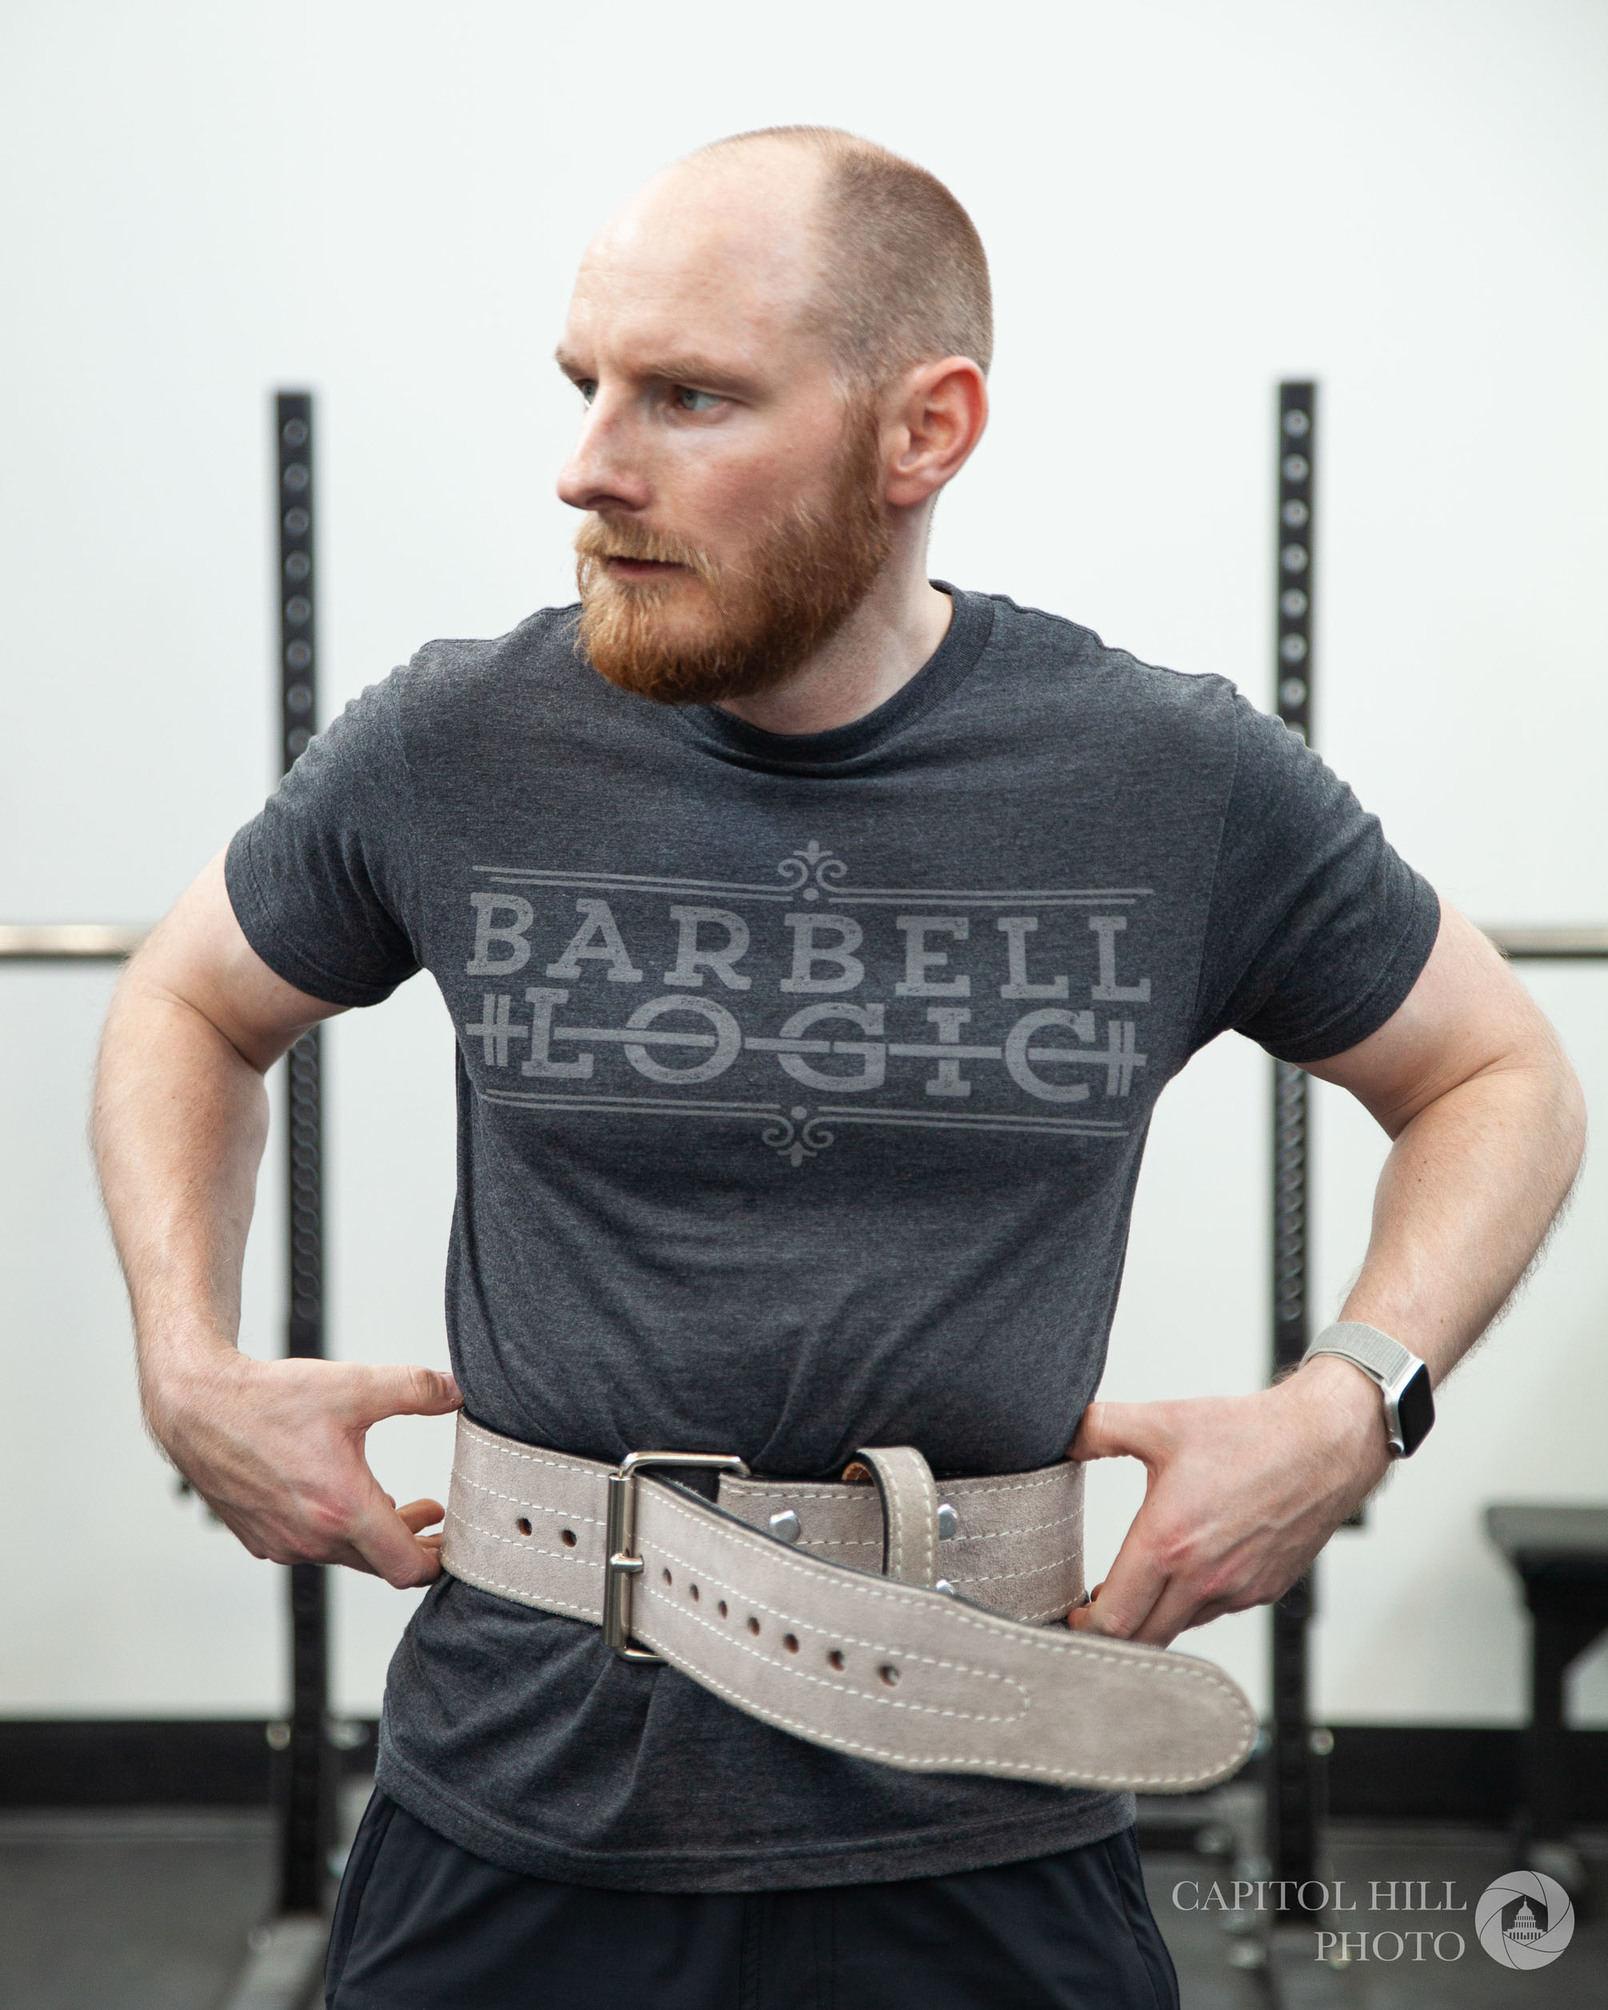 Putting on lifting belt